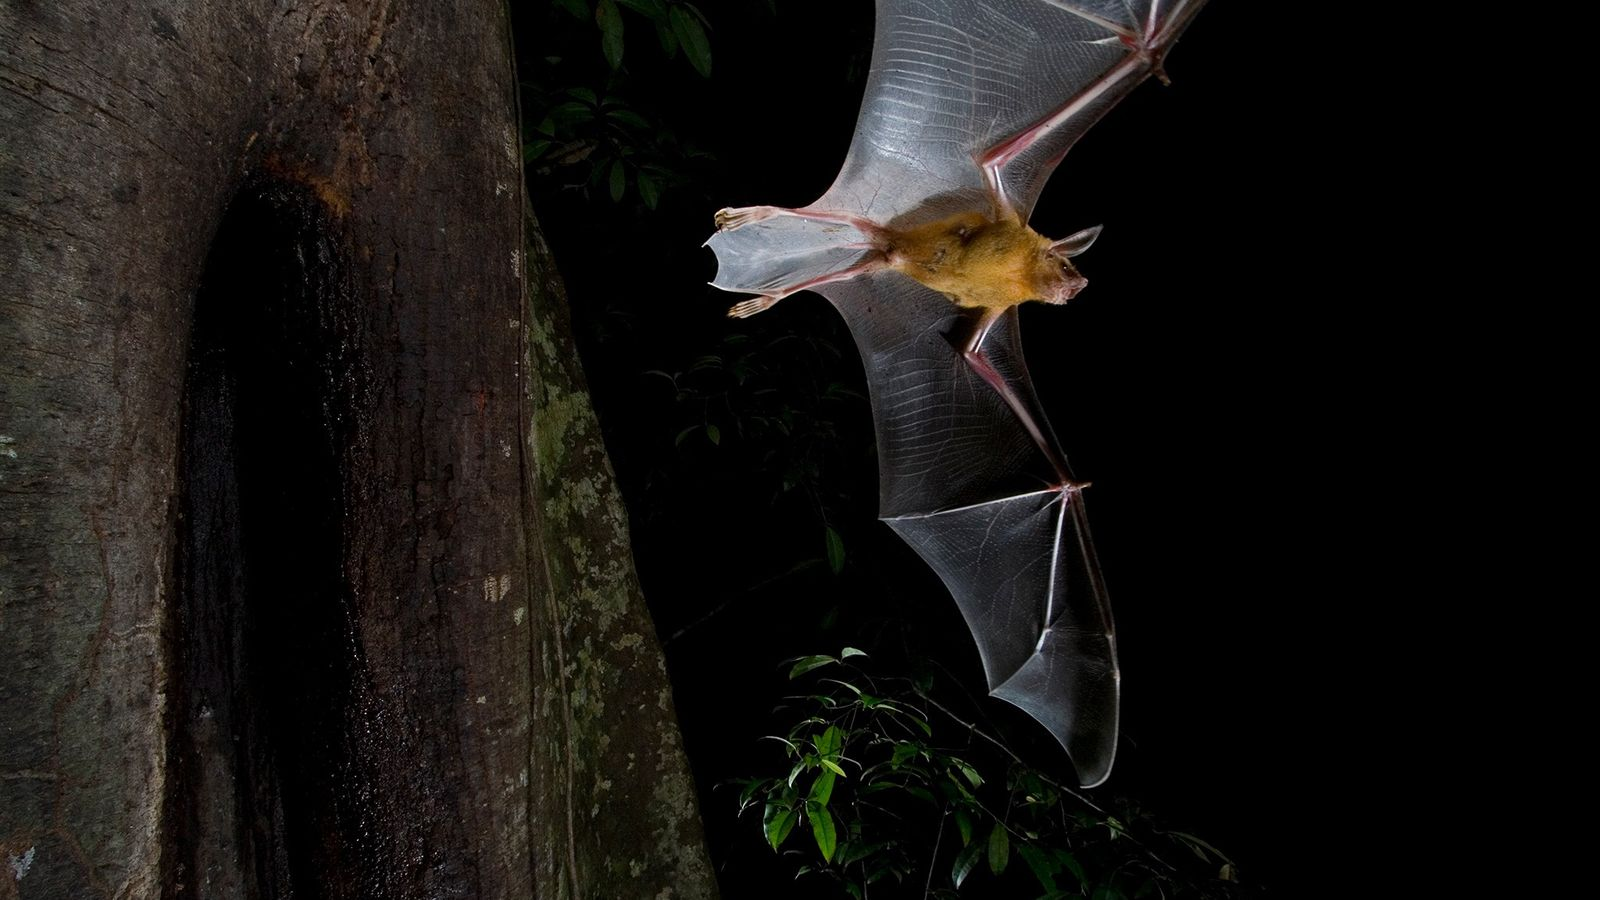 Los murciélagos, como este murciélago pescador que toma peces con las patas, suelen ser criaturas de ...